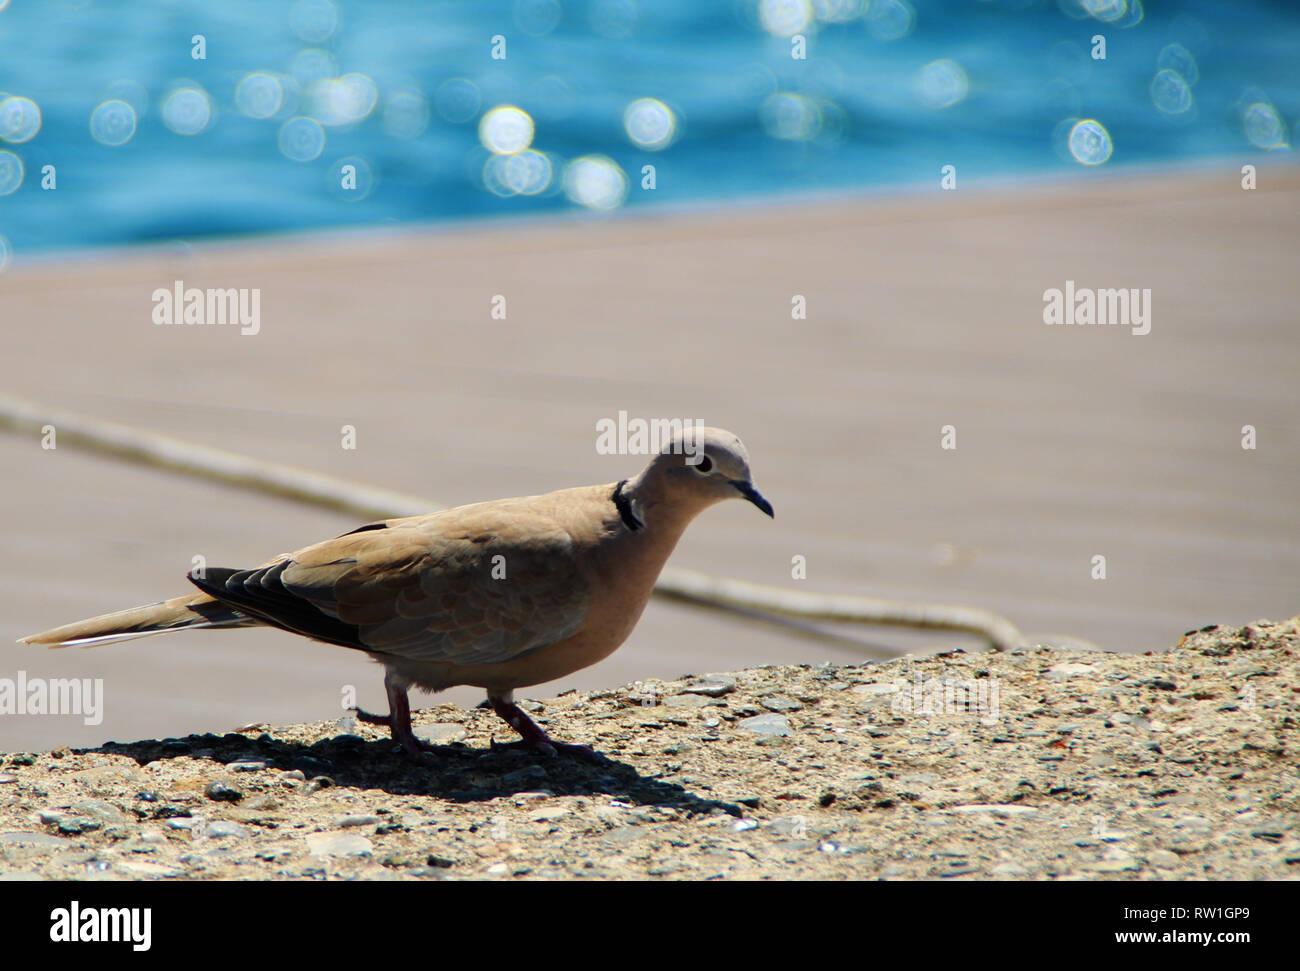 Pigeon sitting near the seaside - Stock Image